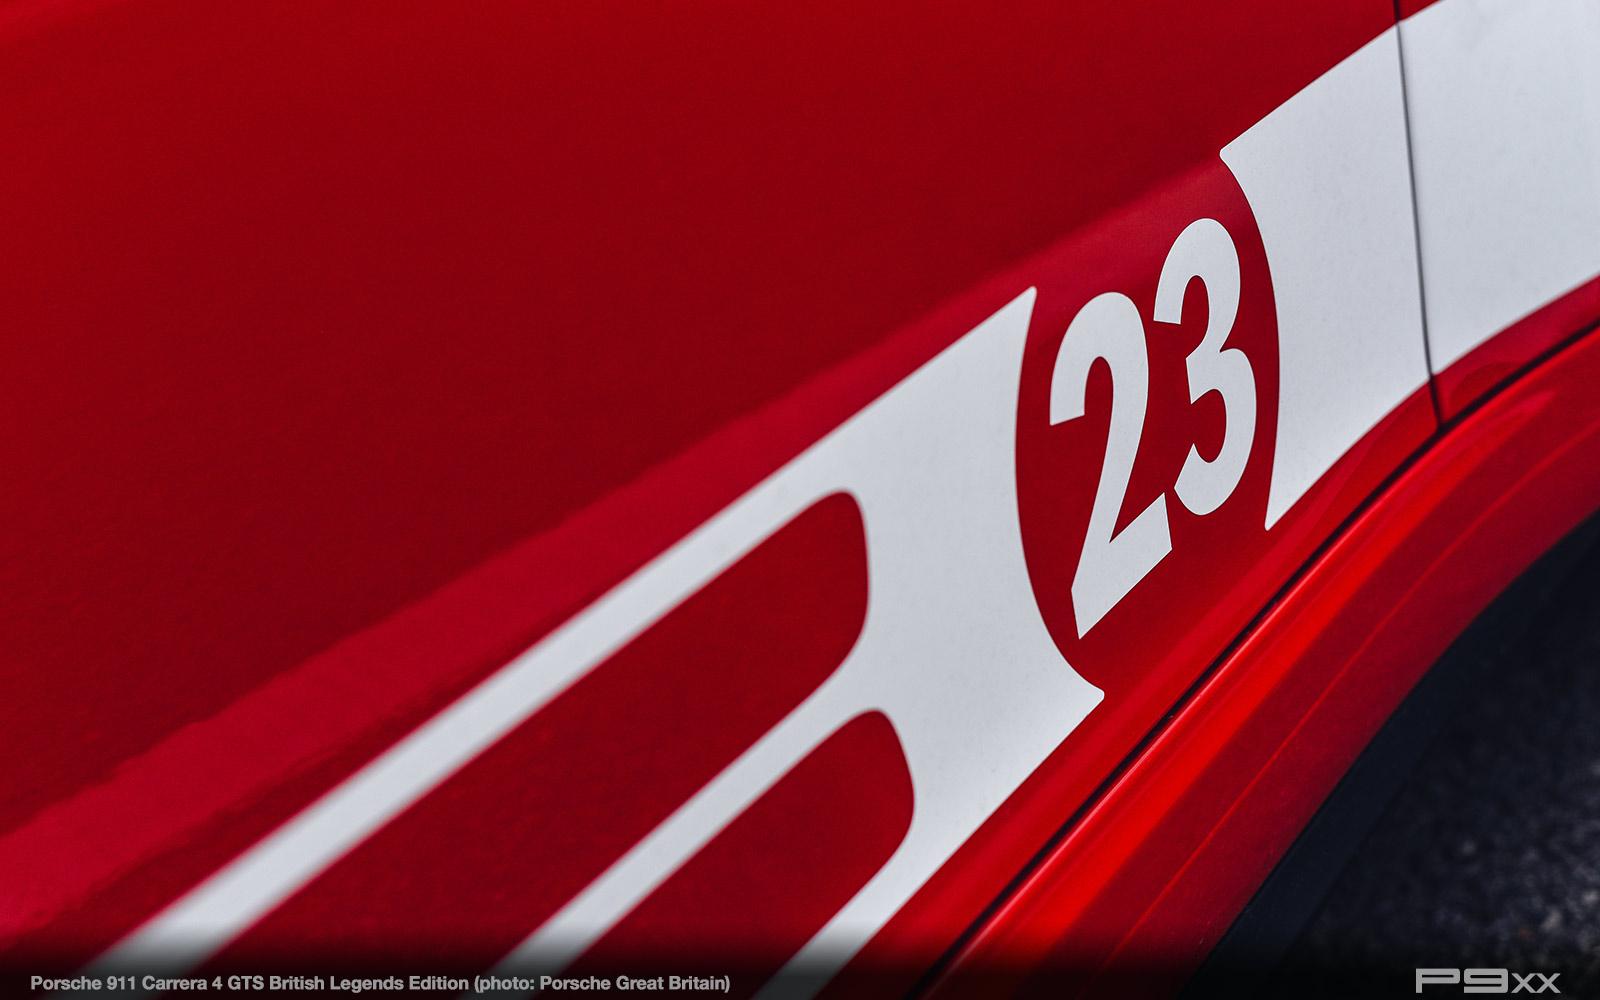 Porsche-911-Carrera-4-GTS-British-Legends-Edition-365